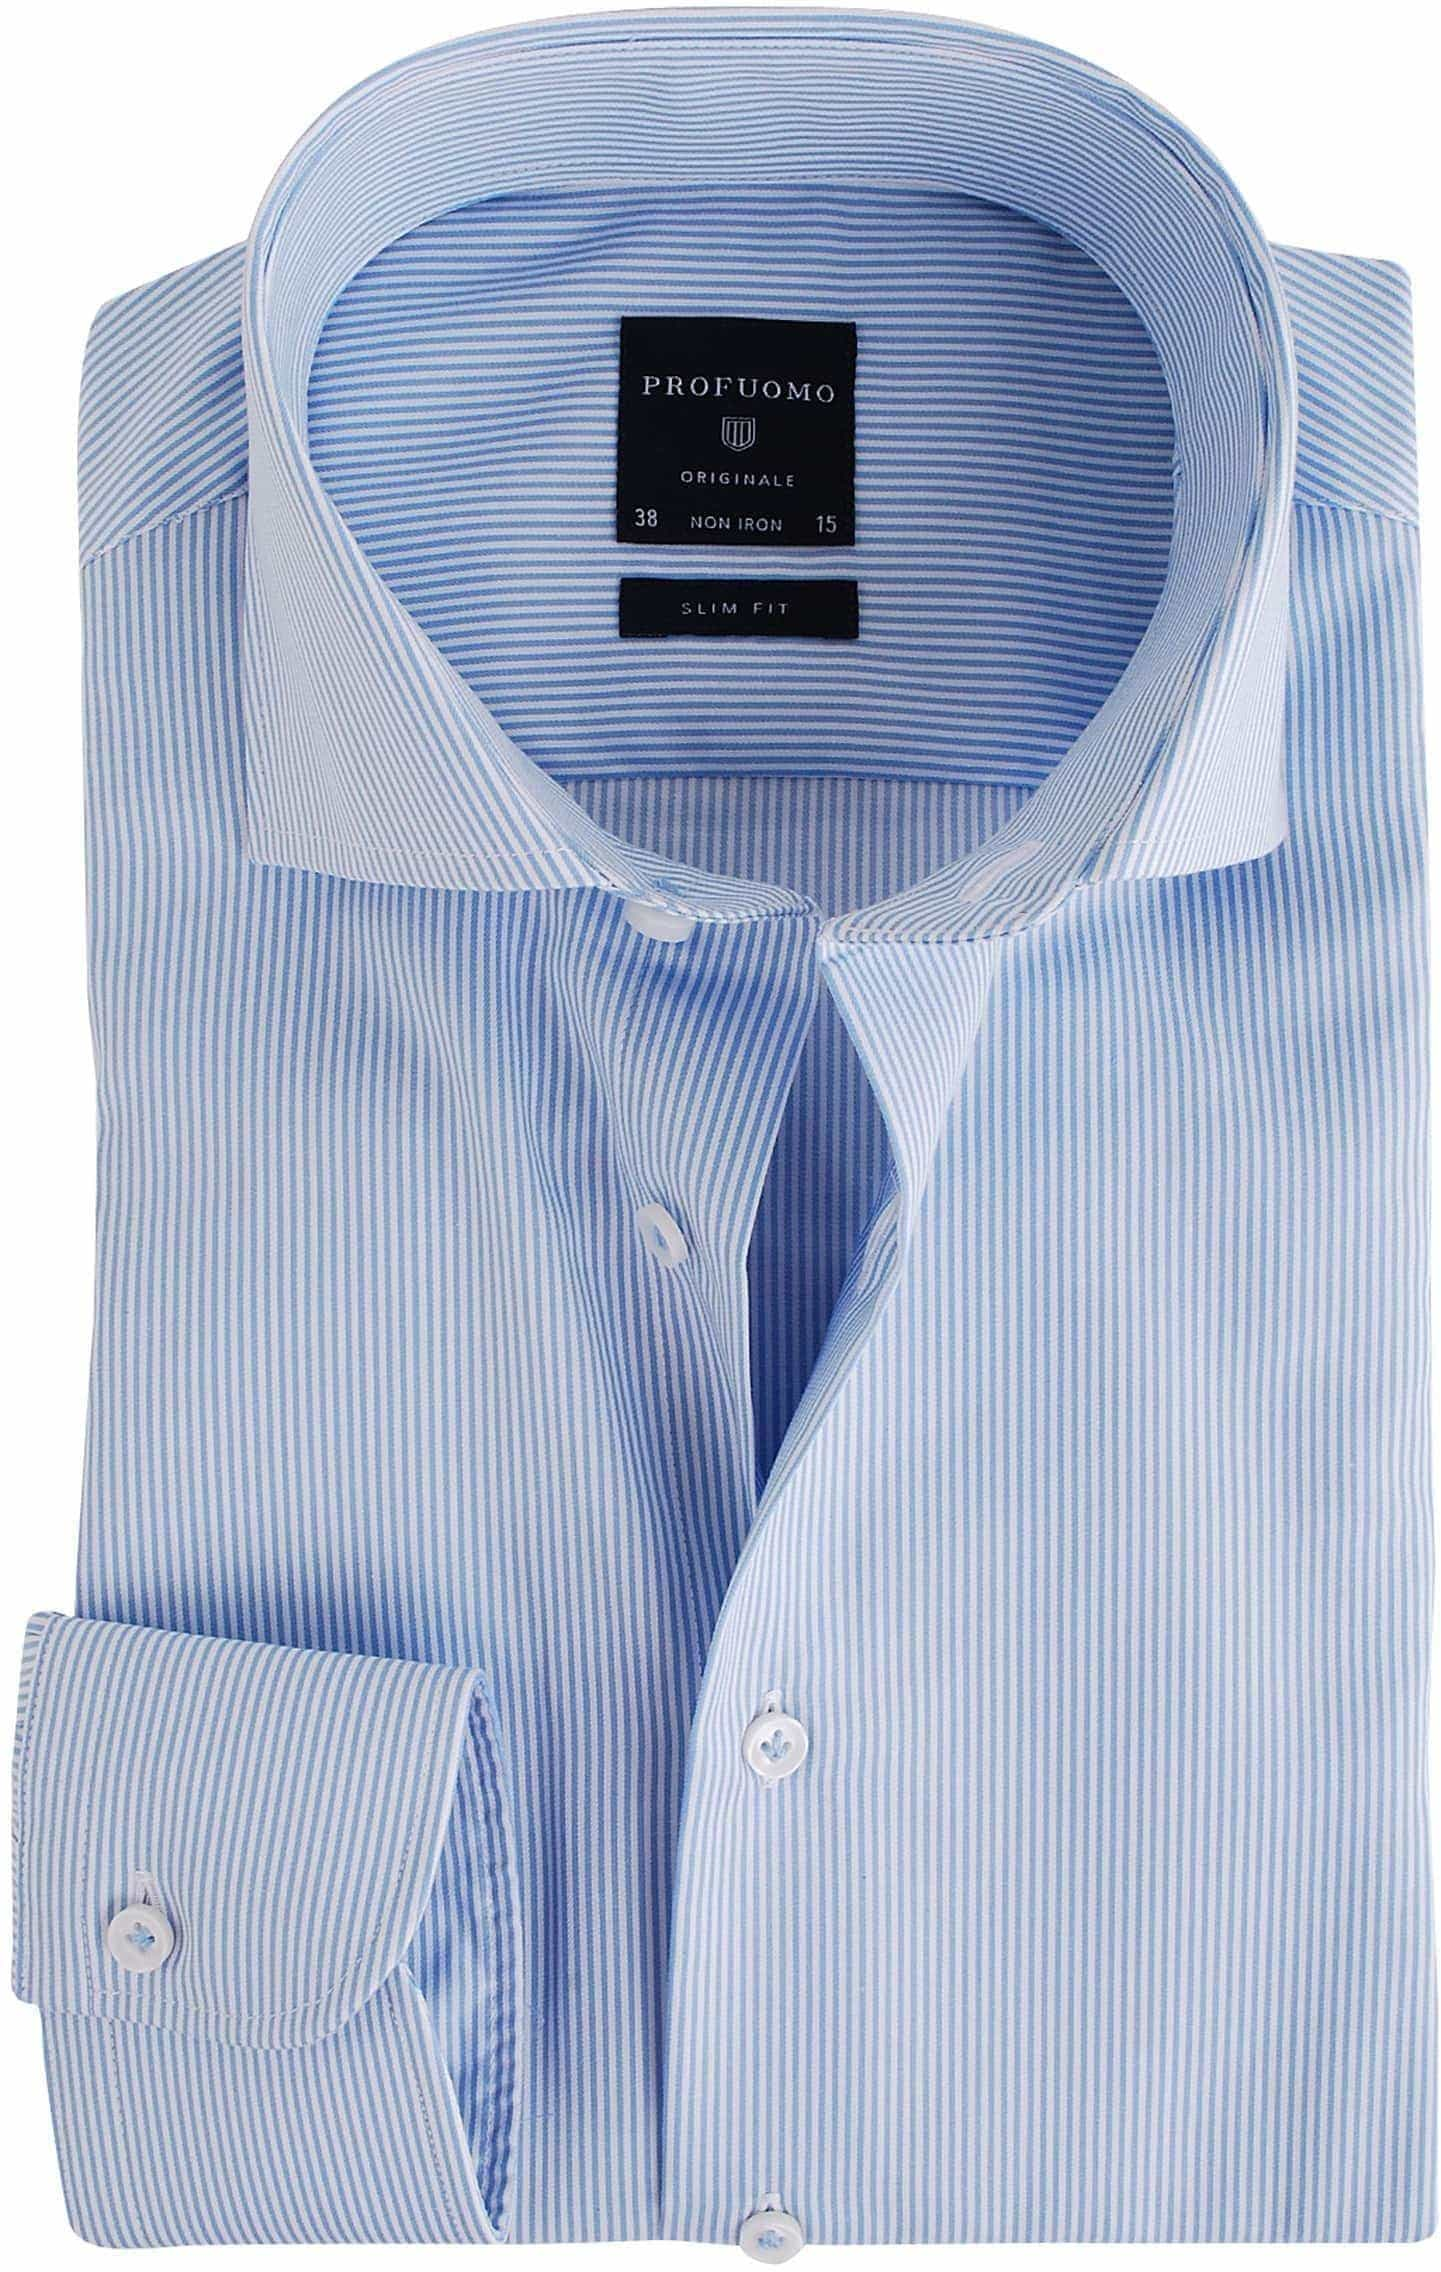 Profuomo Overhemd Lichtblauw Gestreept foto 0